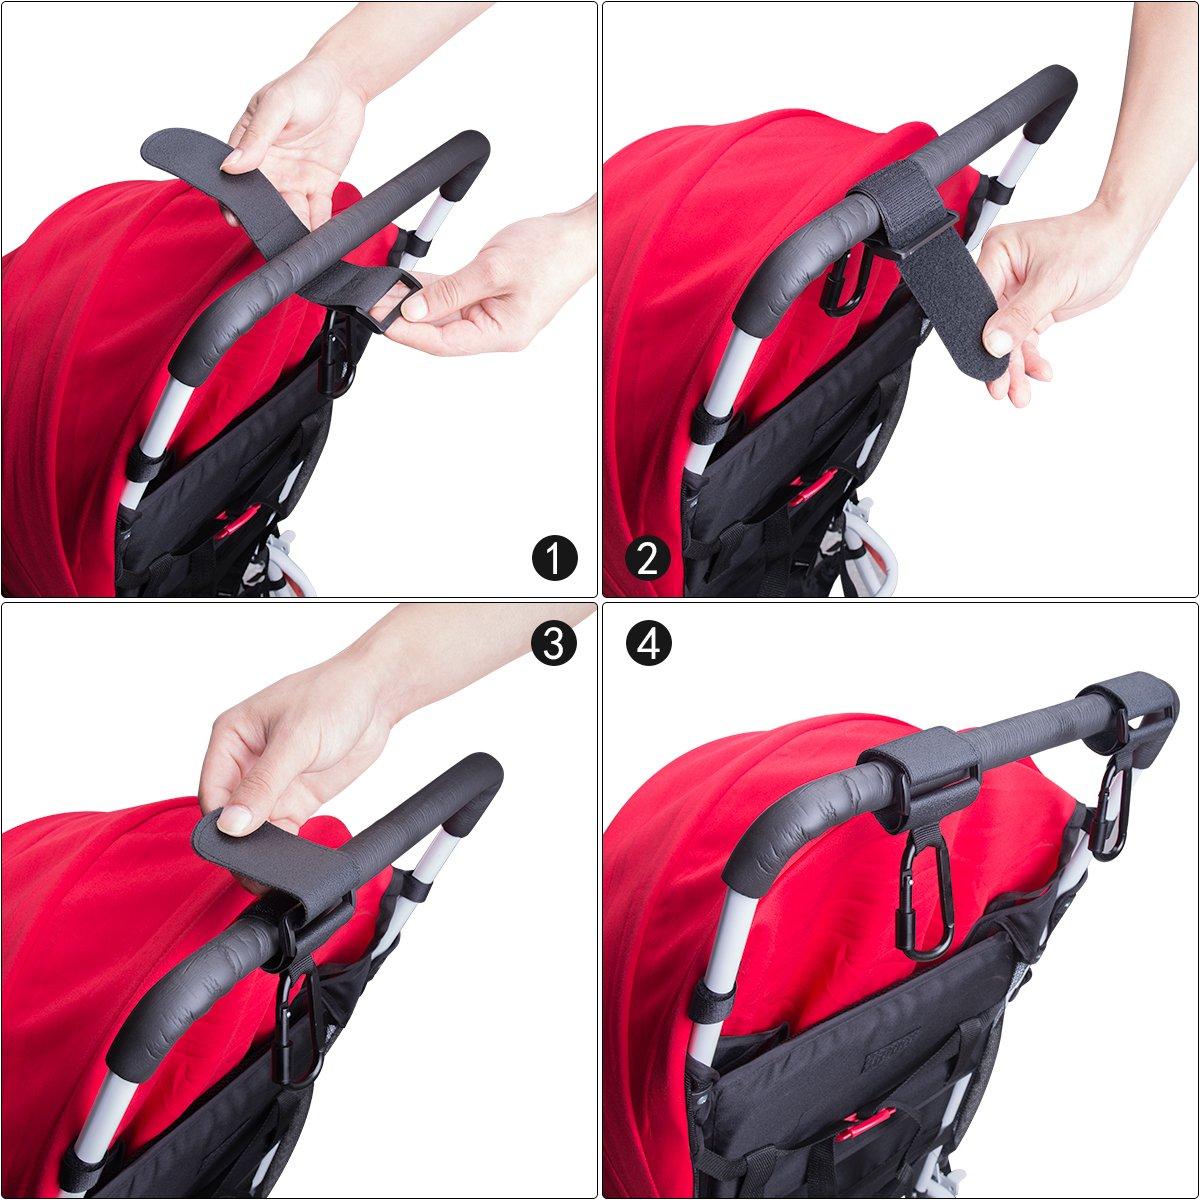 Stroller Hook Set, Pack of Handy Pram Hook Buggy Hanger Clip + Stroller Net Bag for Baby Diaper Bags Groceries Clothing Purse Stroller Accessories Kit Hangs for Jogging Walking/Shopping by fantaseal (Image #6)